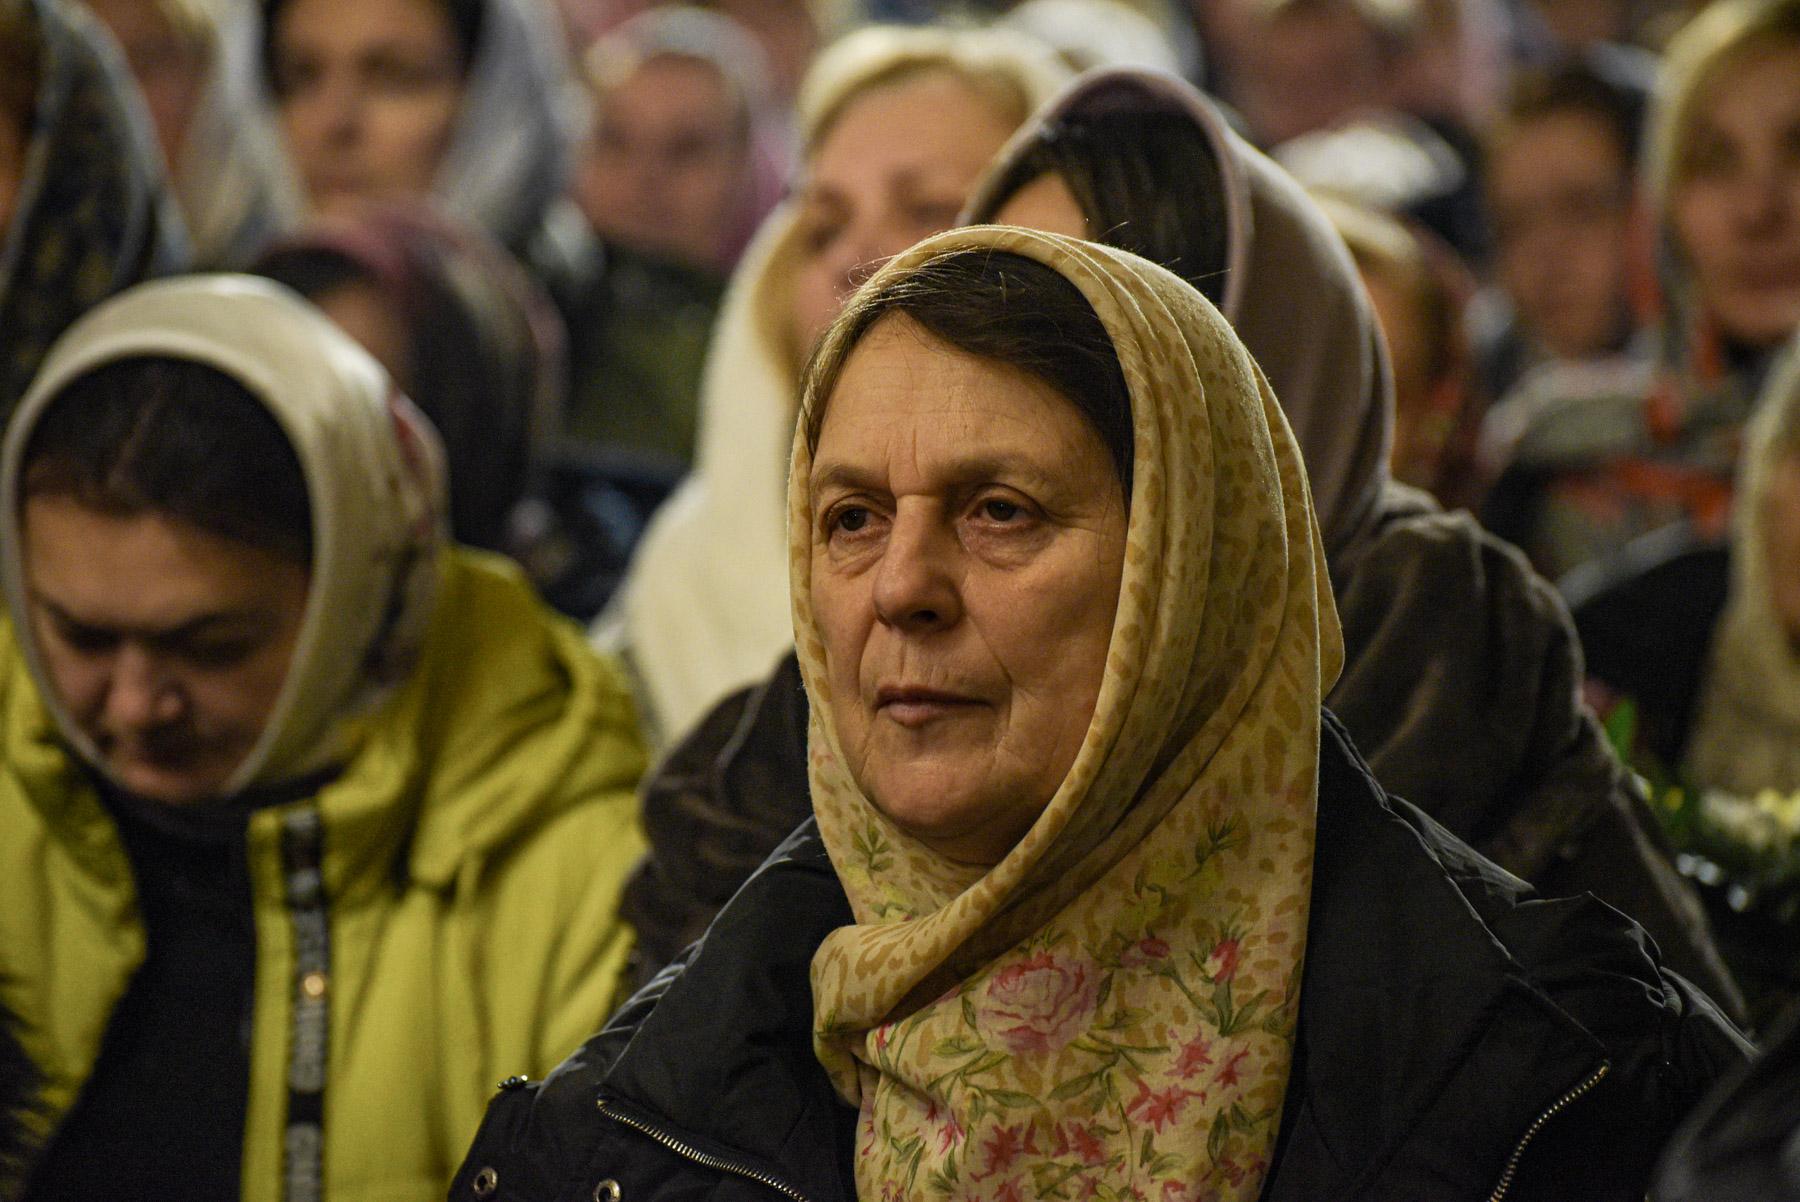 photos of orthodox christmas 0217 2